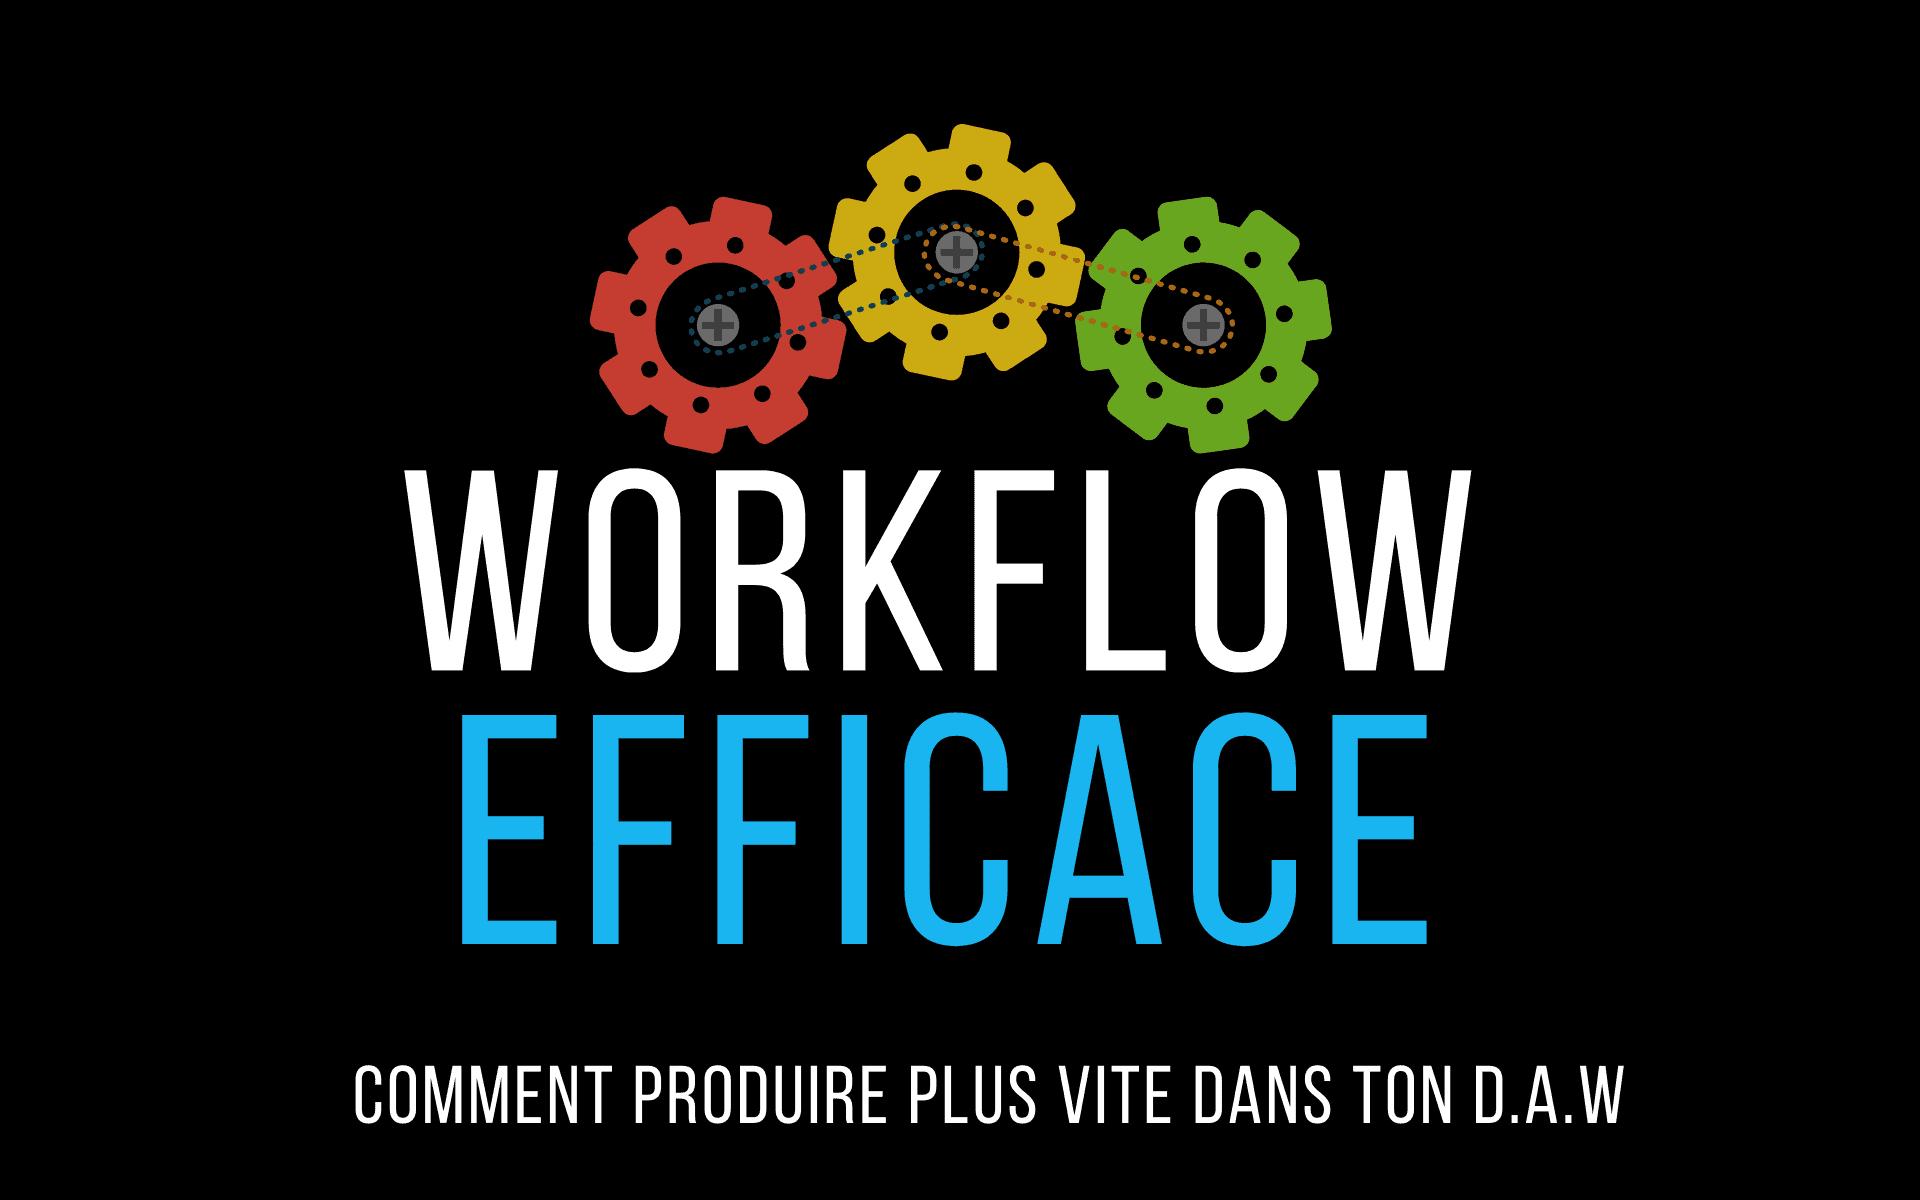 workflow efficace